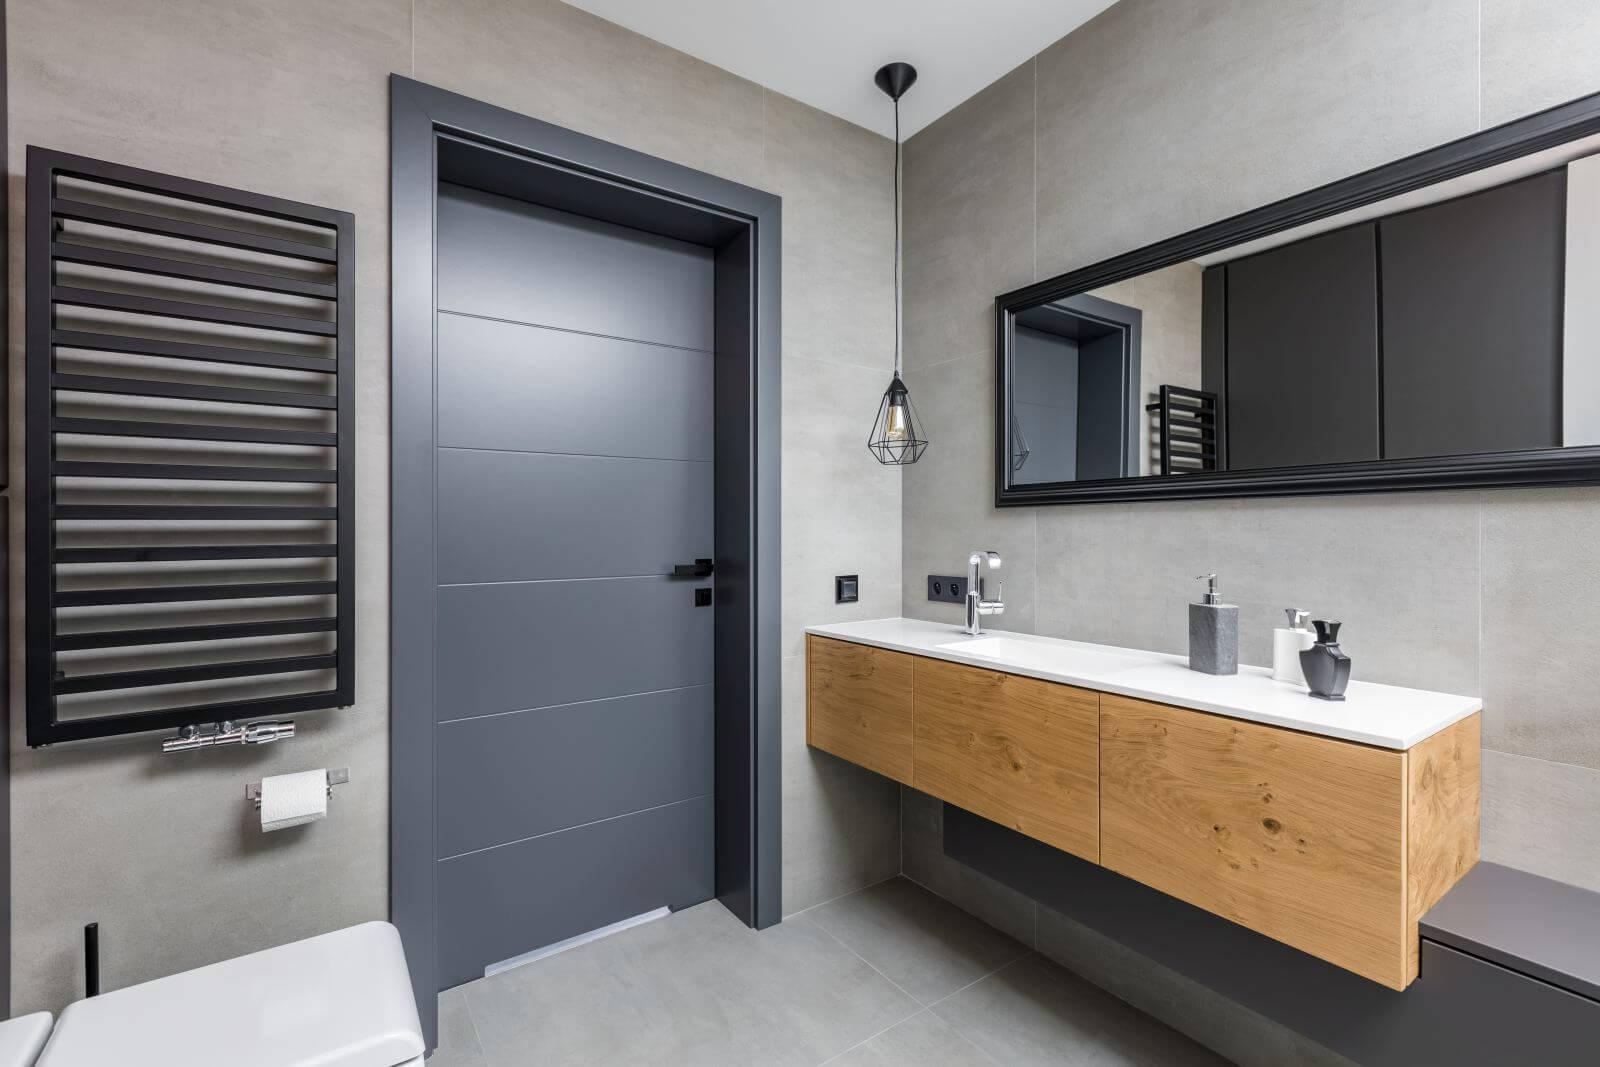 Dark and elegant bathroom with countertop basin and mirror